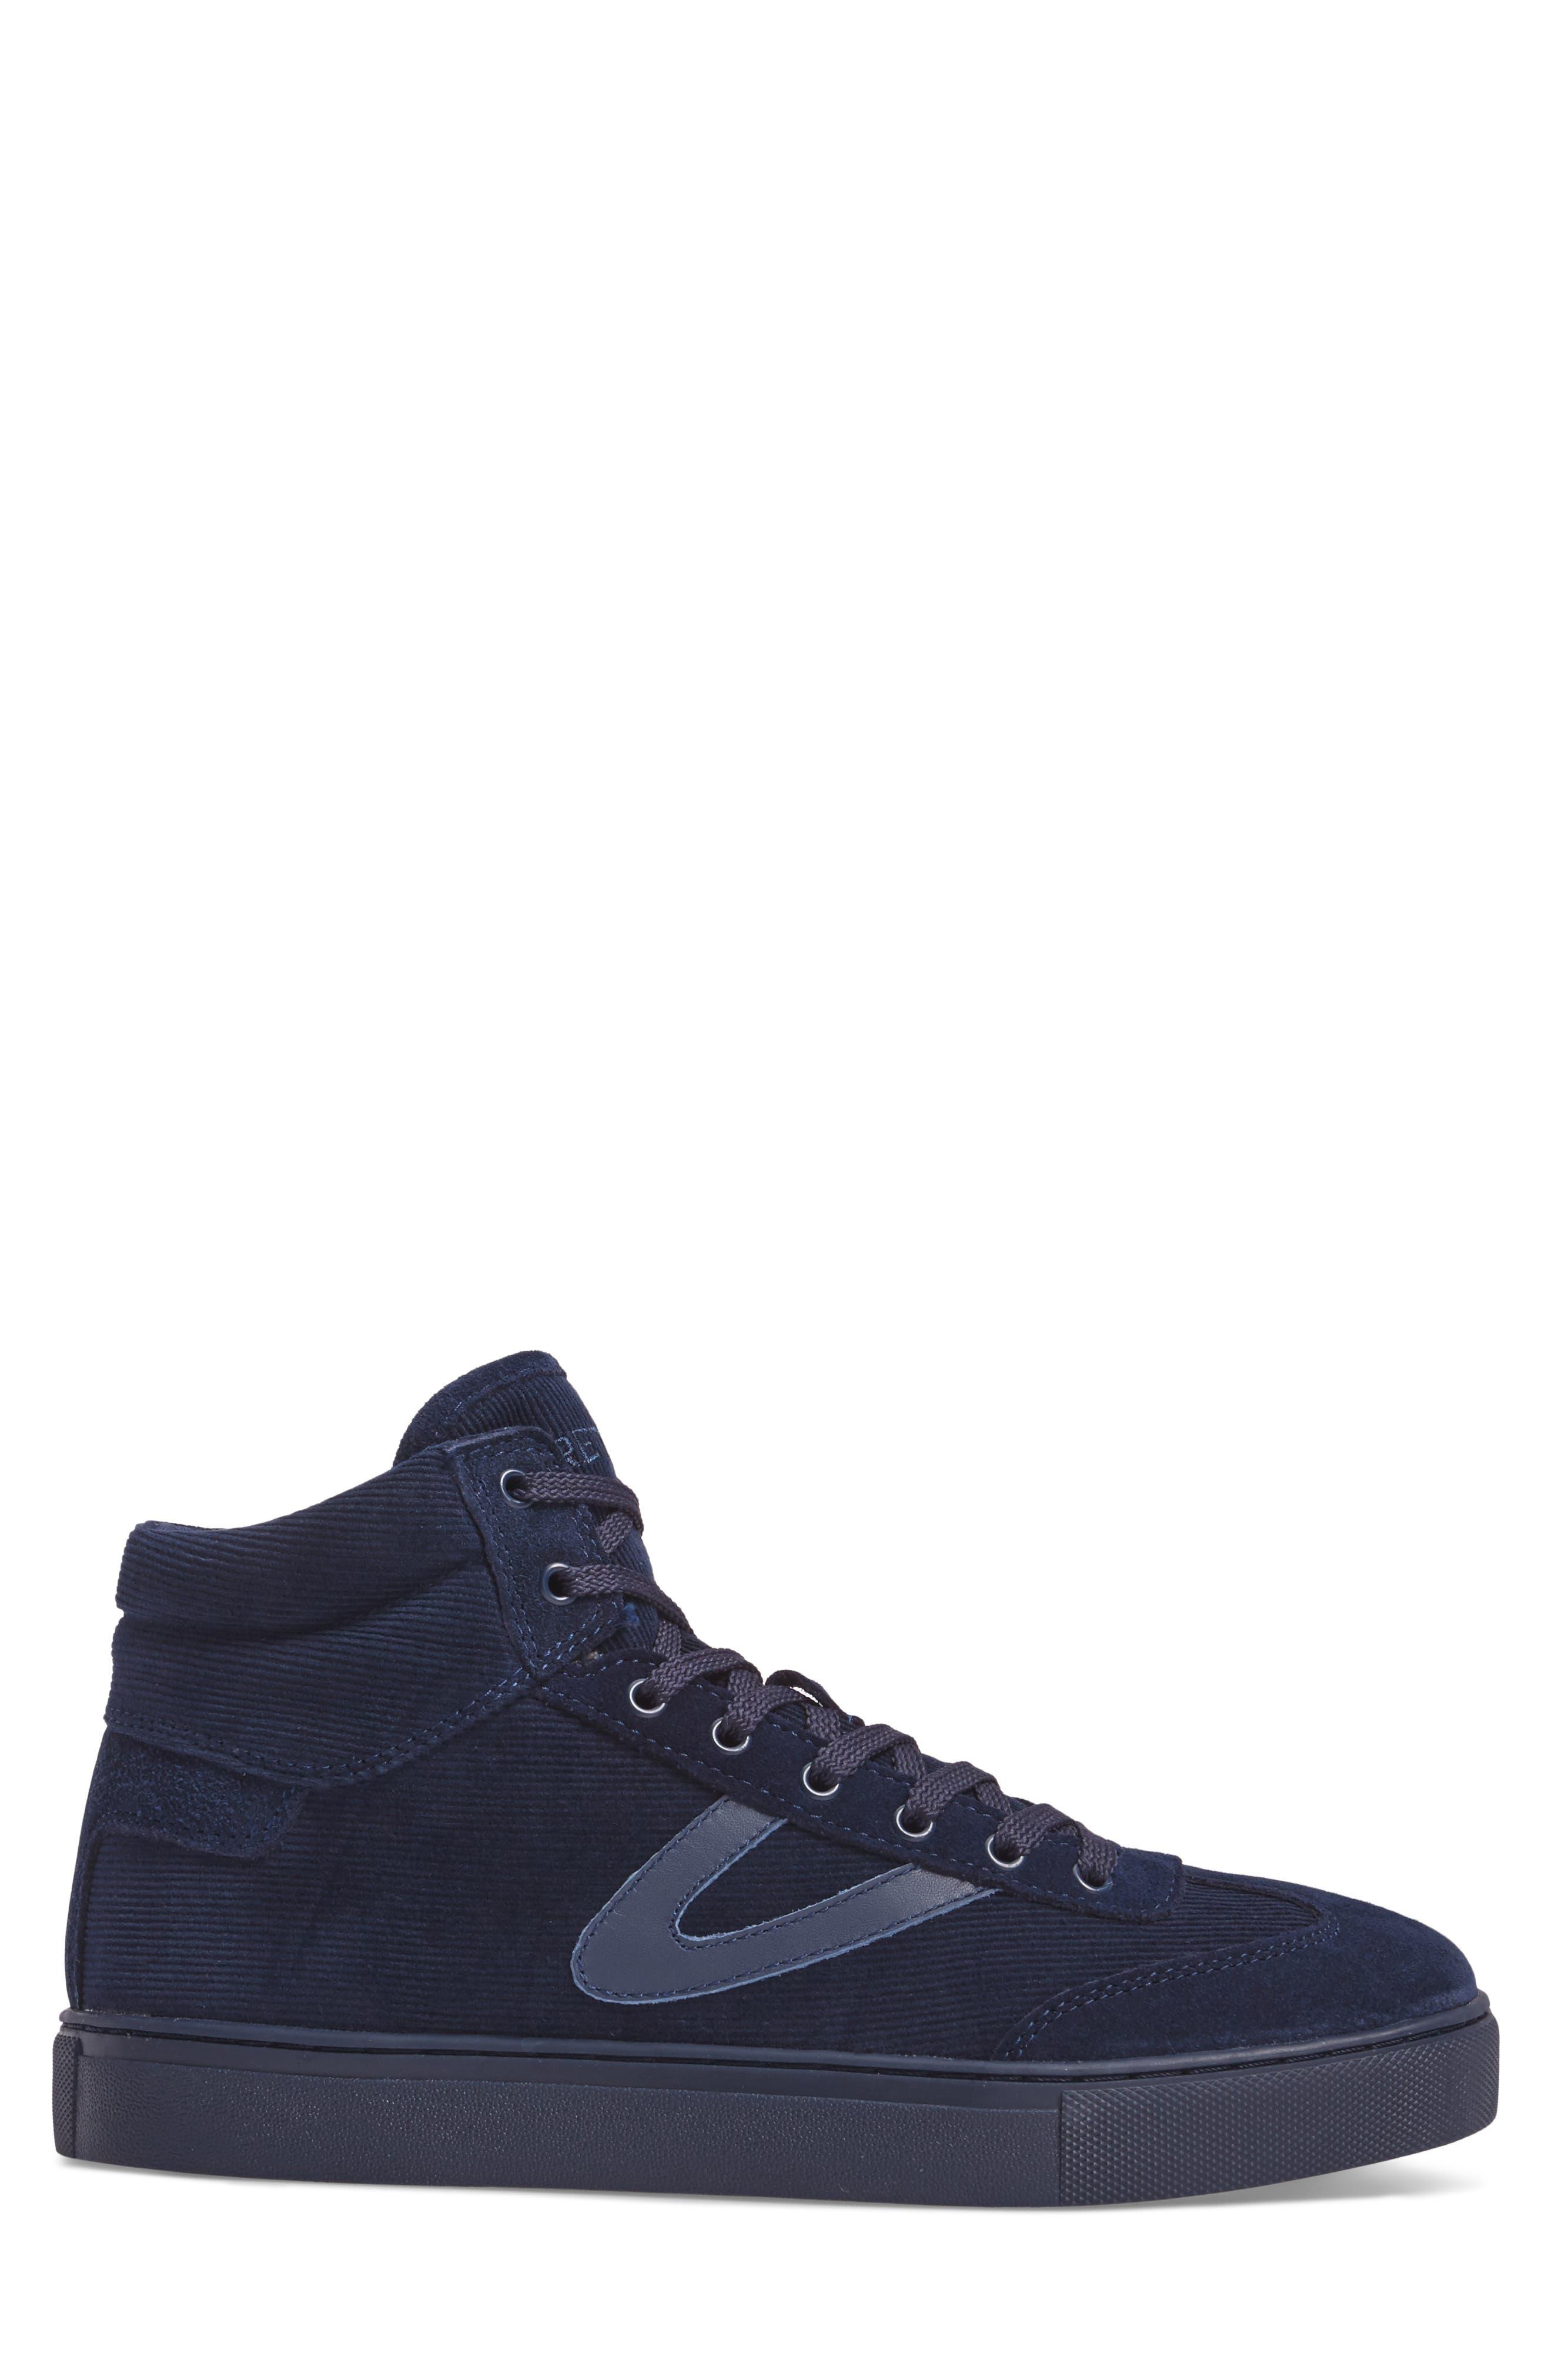 Jack High Top Sneaker,                             Alternate thumbnail 6, color,